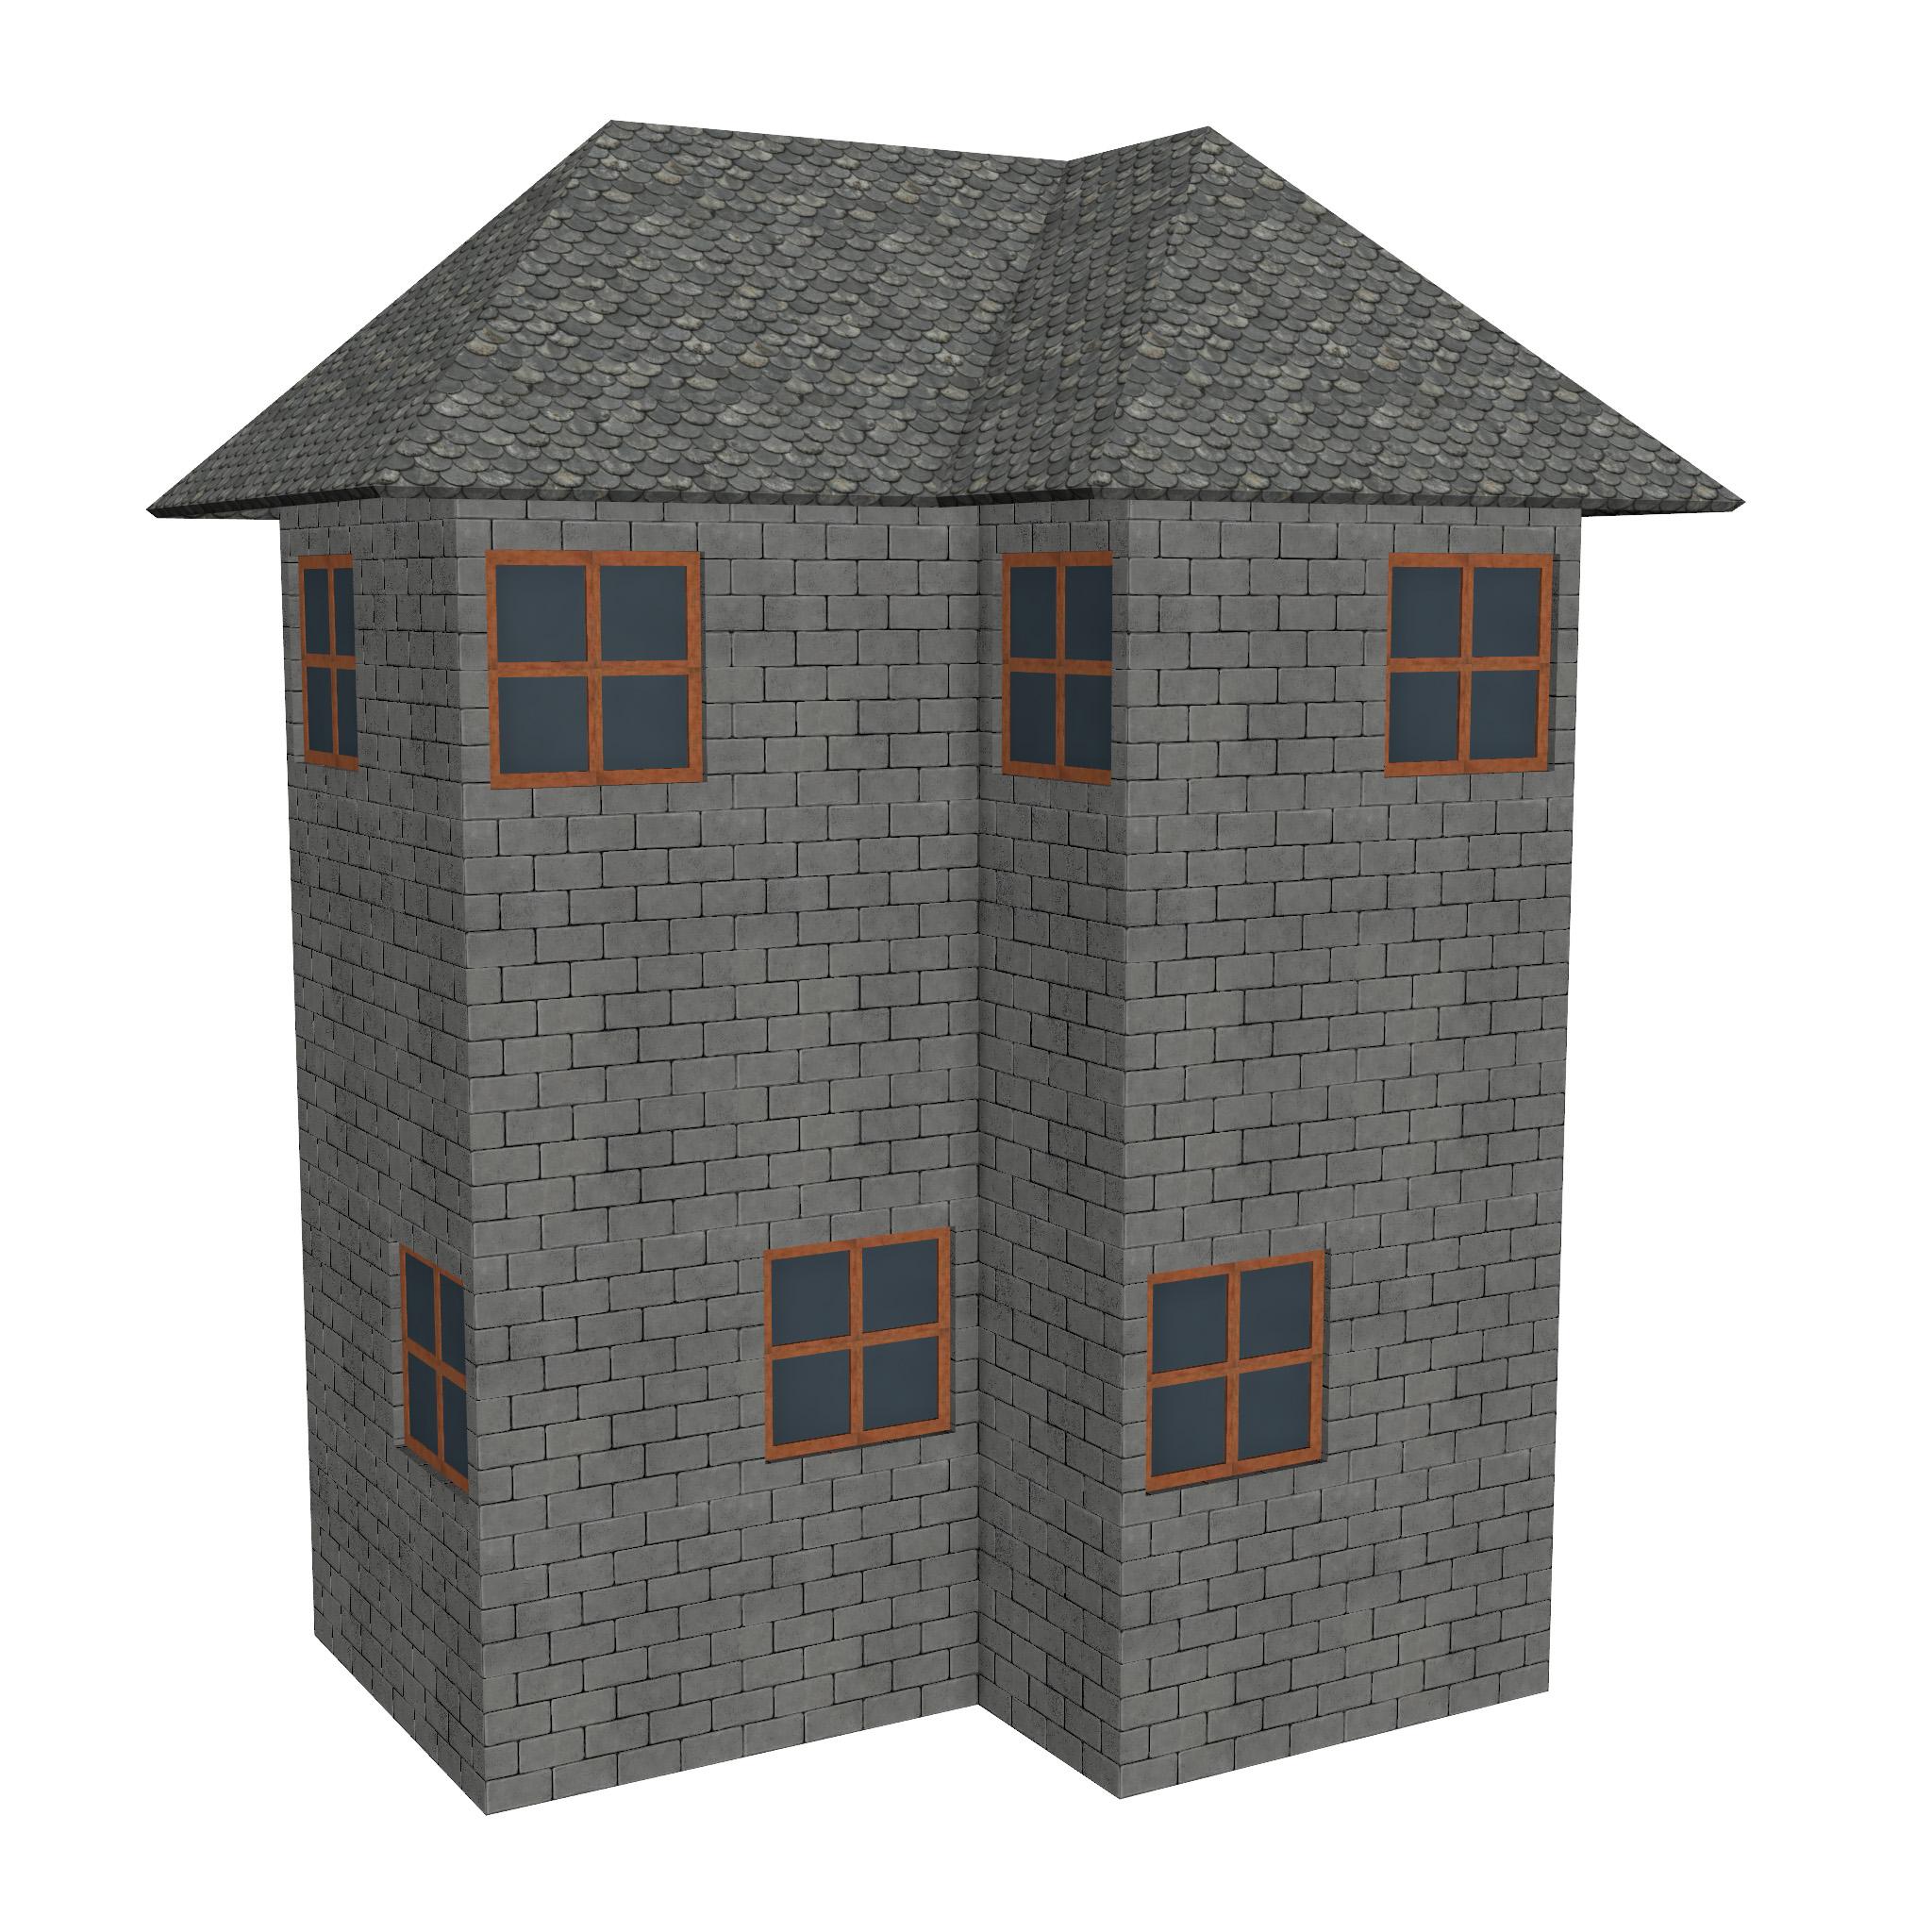 modular brick house set 3d model fbx ma mb 271398